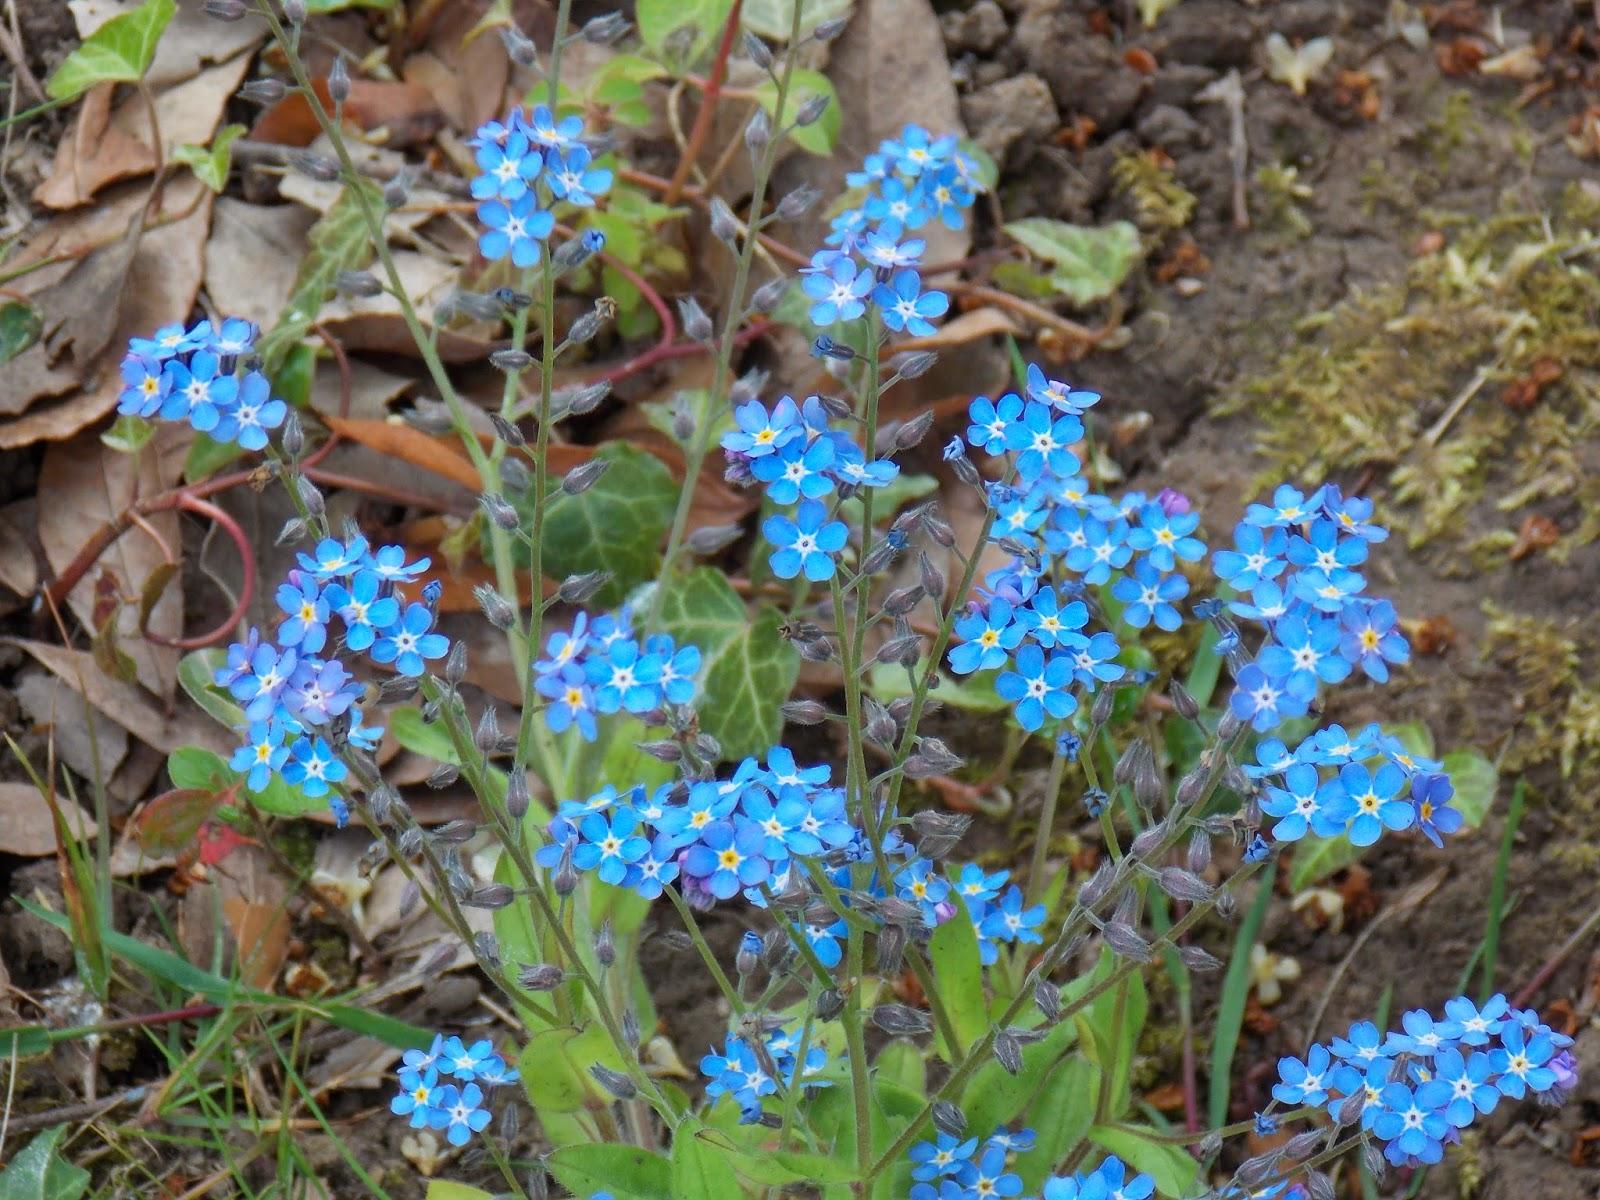 Ecolo bio nature permaculture urbaine et jardinage bio for Fleurs de nos jardins